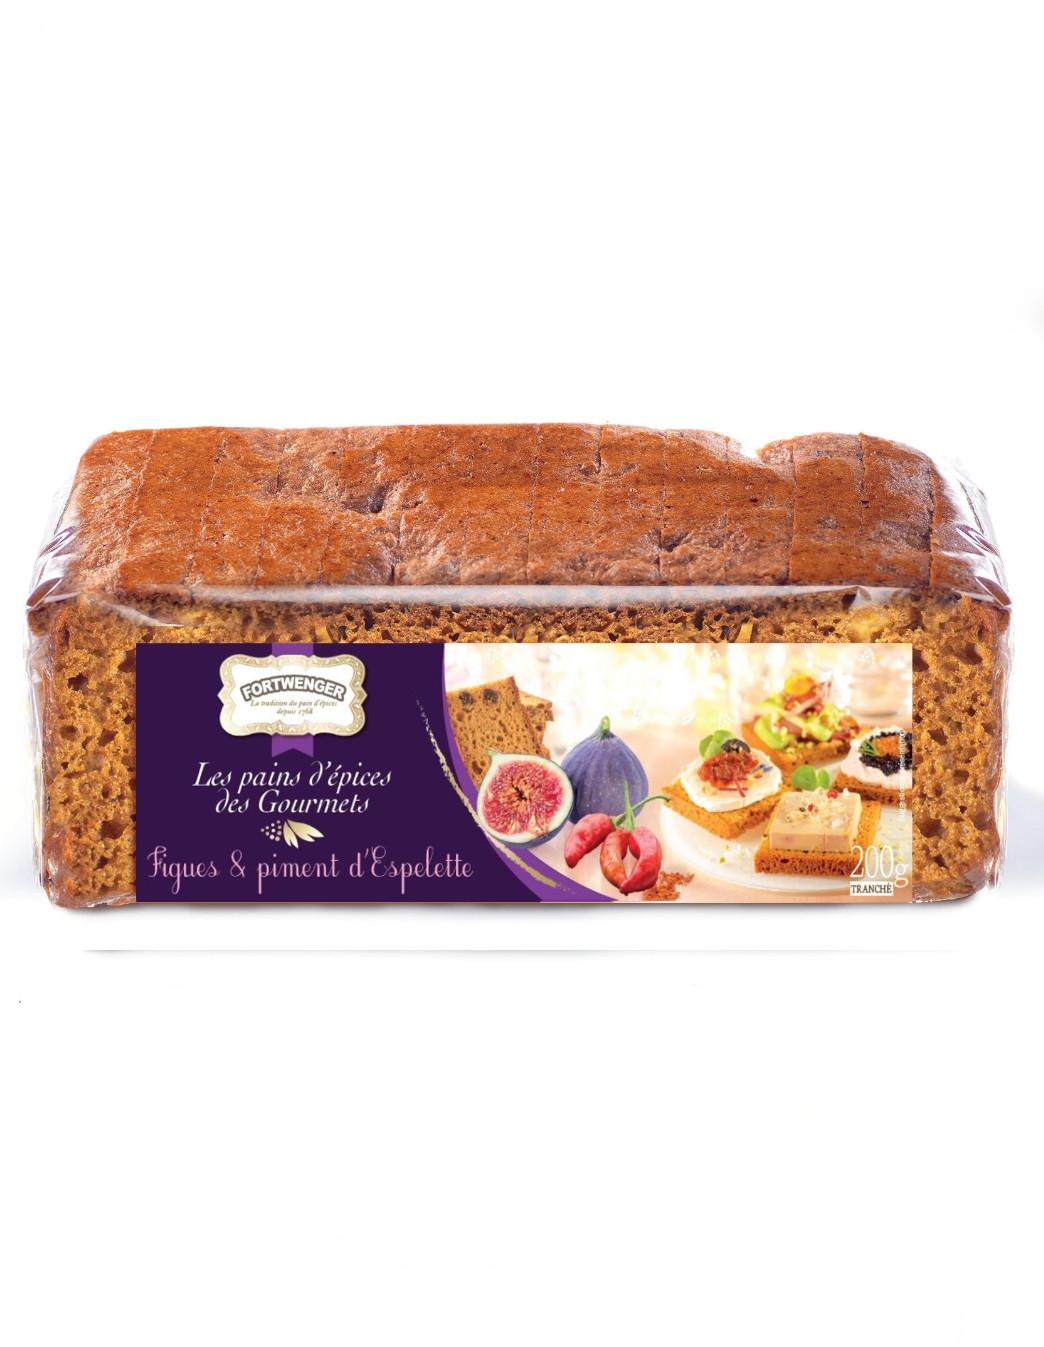 Gourmets' gingerbread - Figs & Espelette pepper